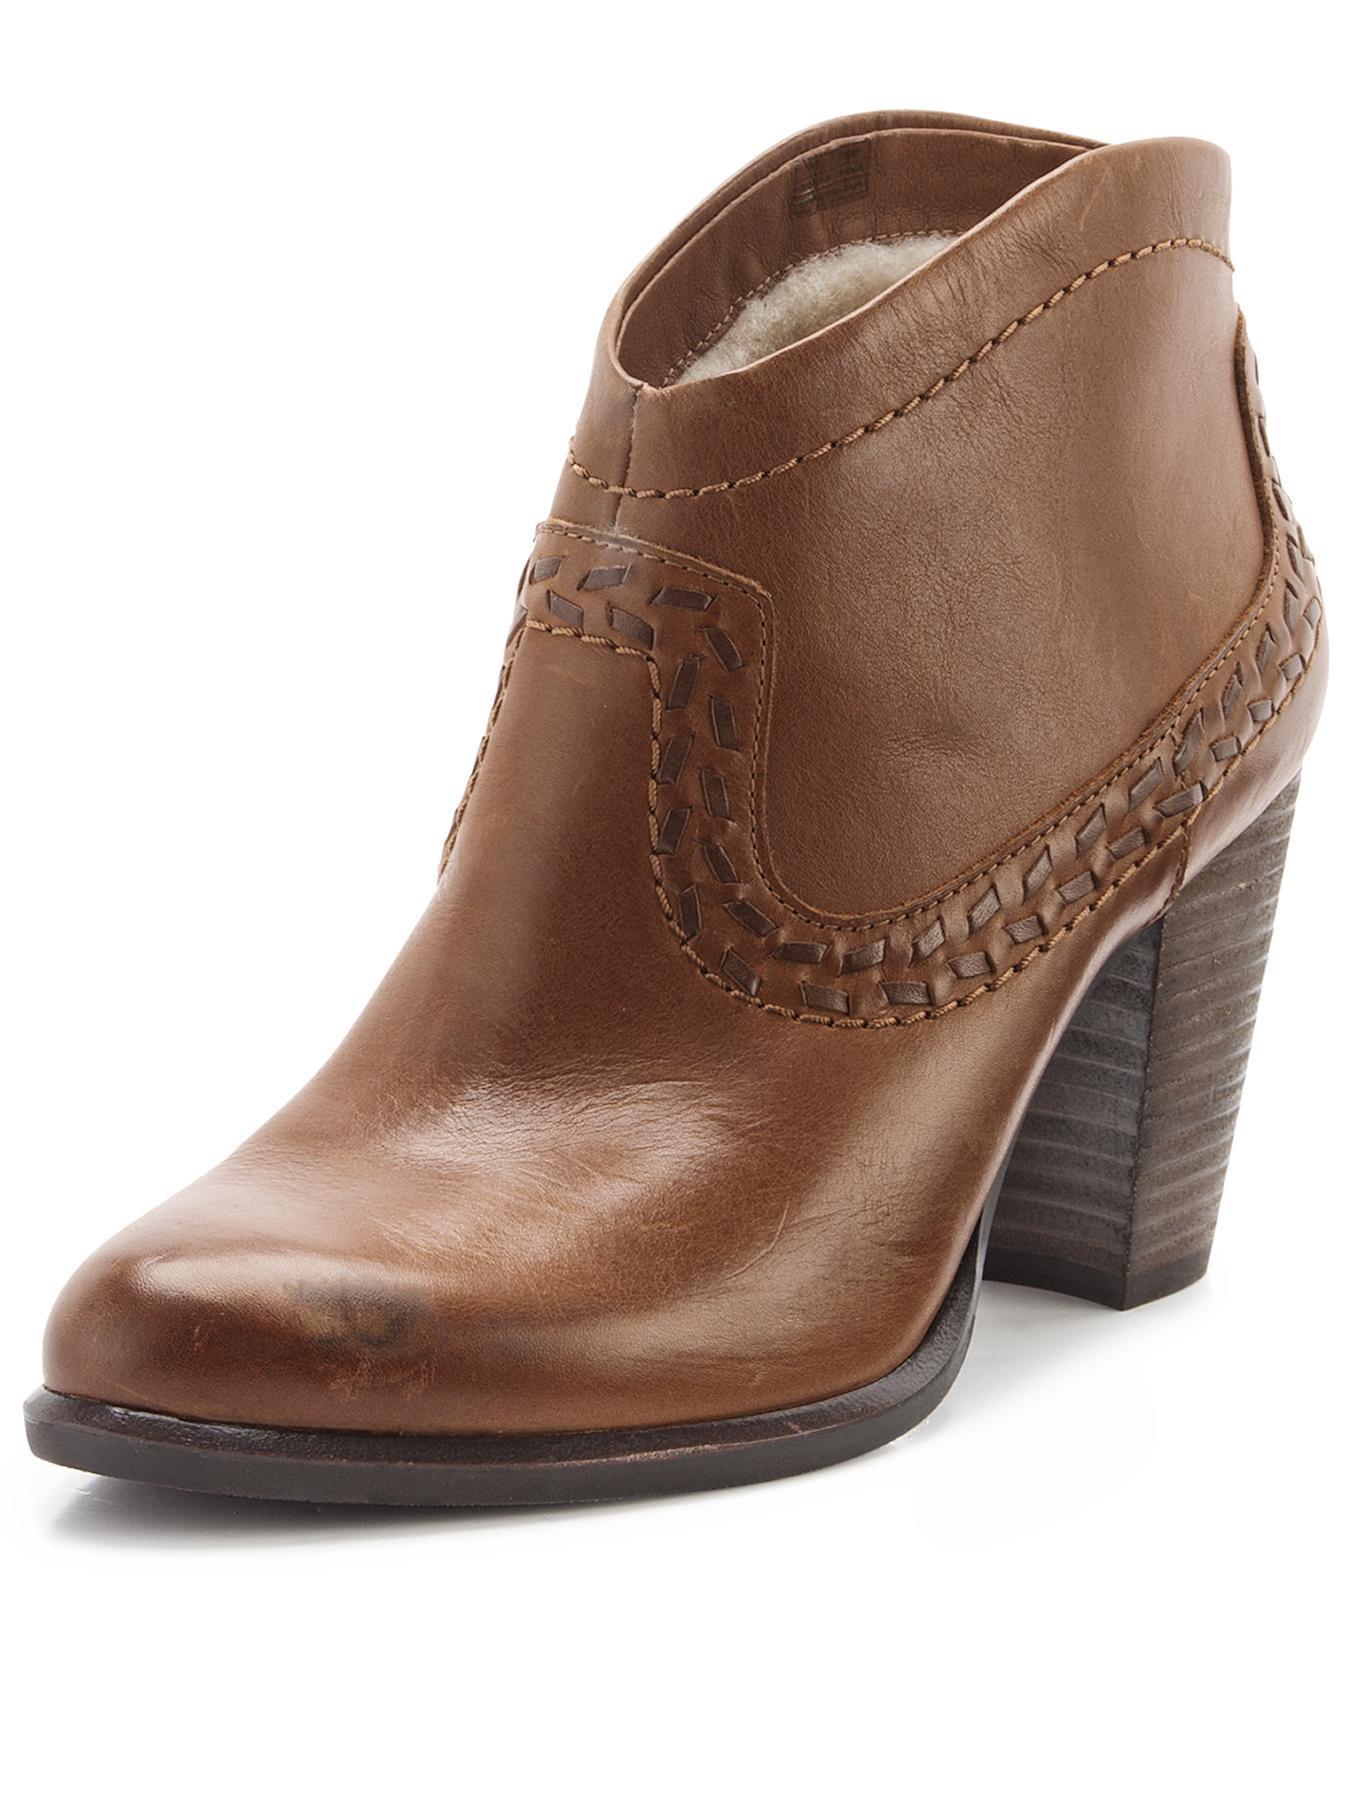 Usefulresults Ugg Ugg Boots Cowboy Cowboy k8nPXO0w